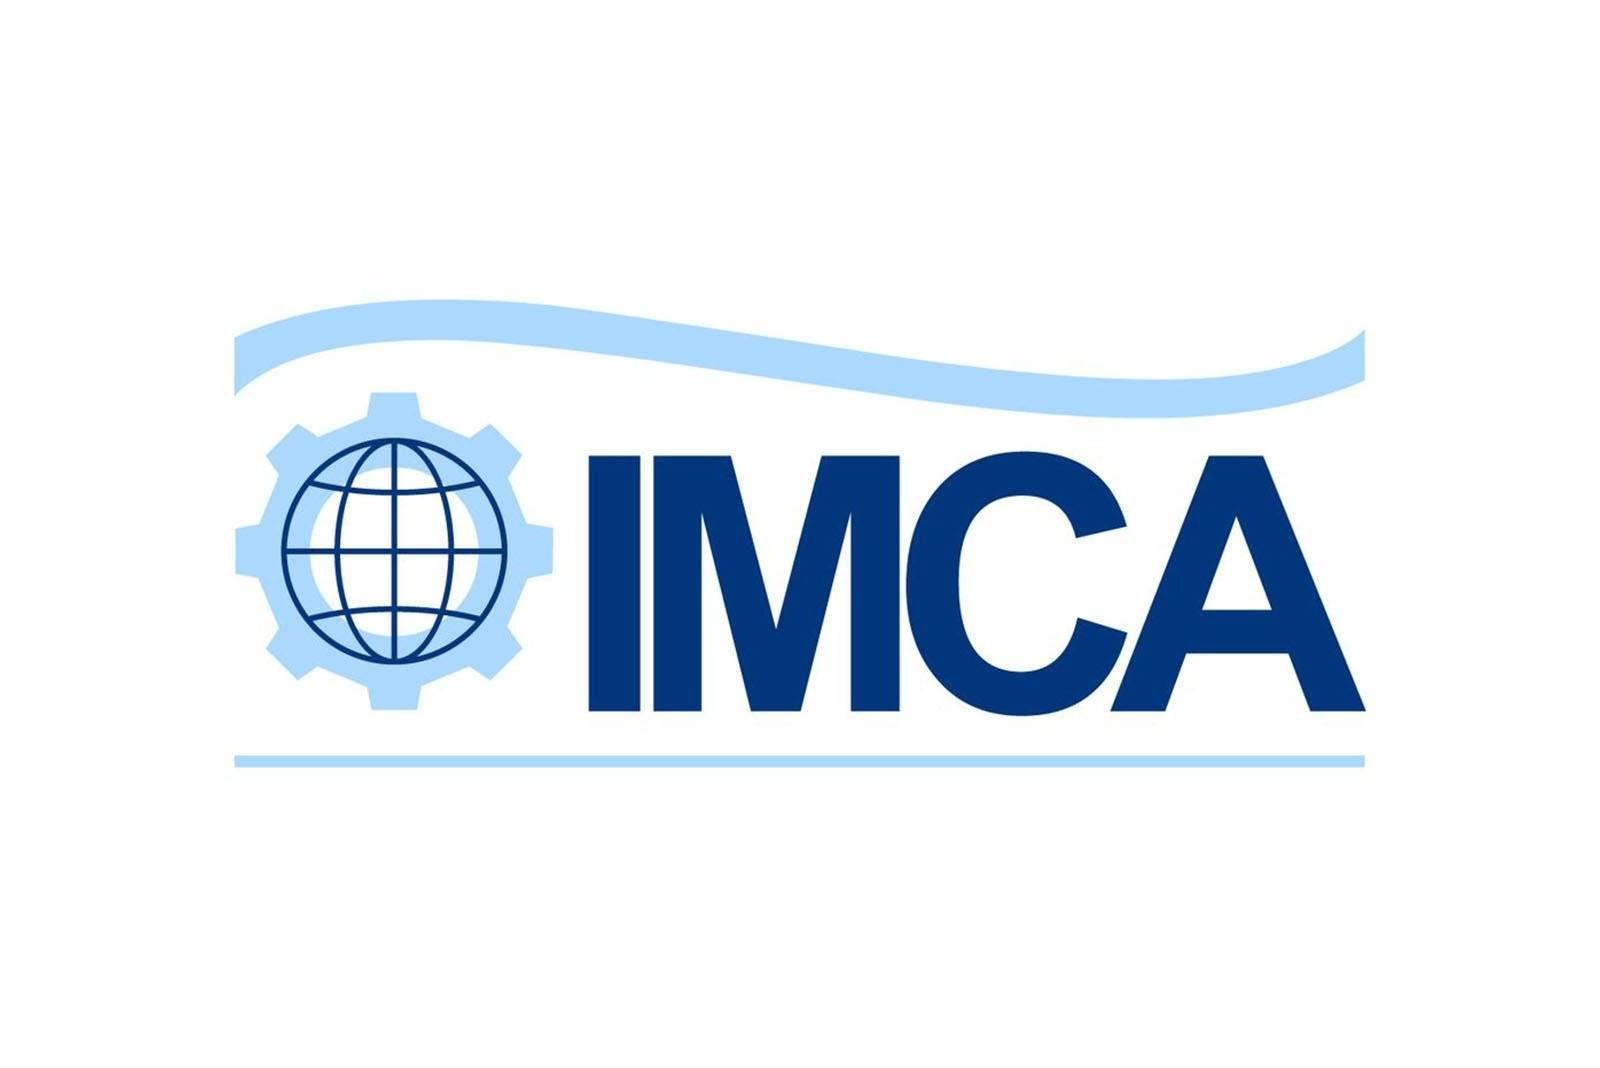 Membership International Marine Contractors Association (IMCA)